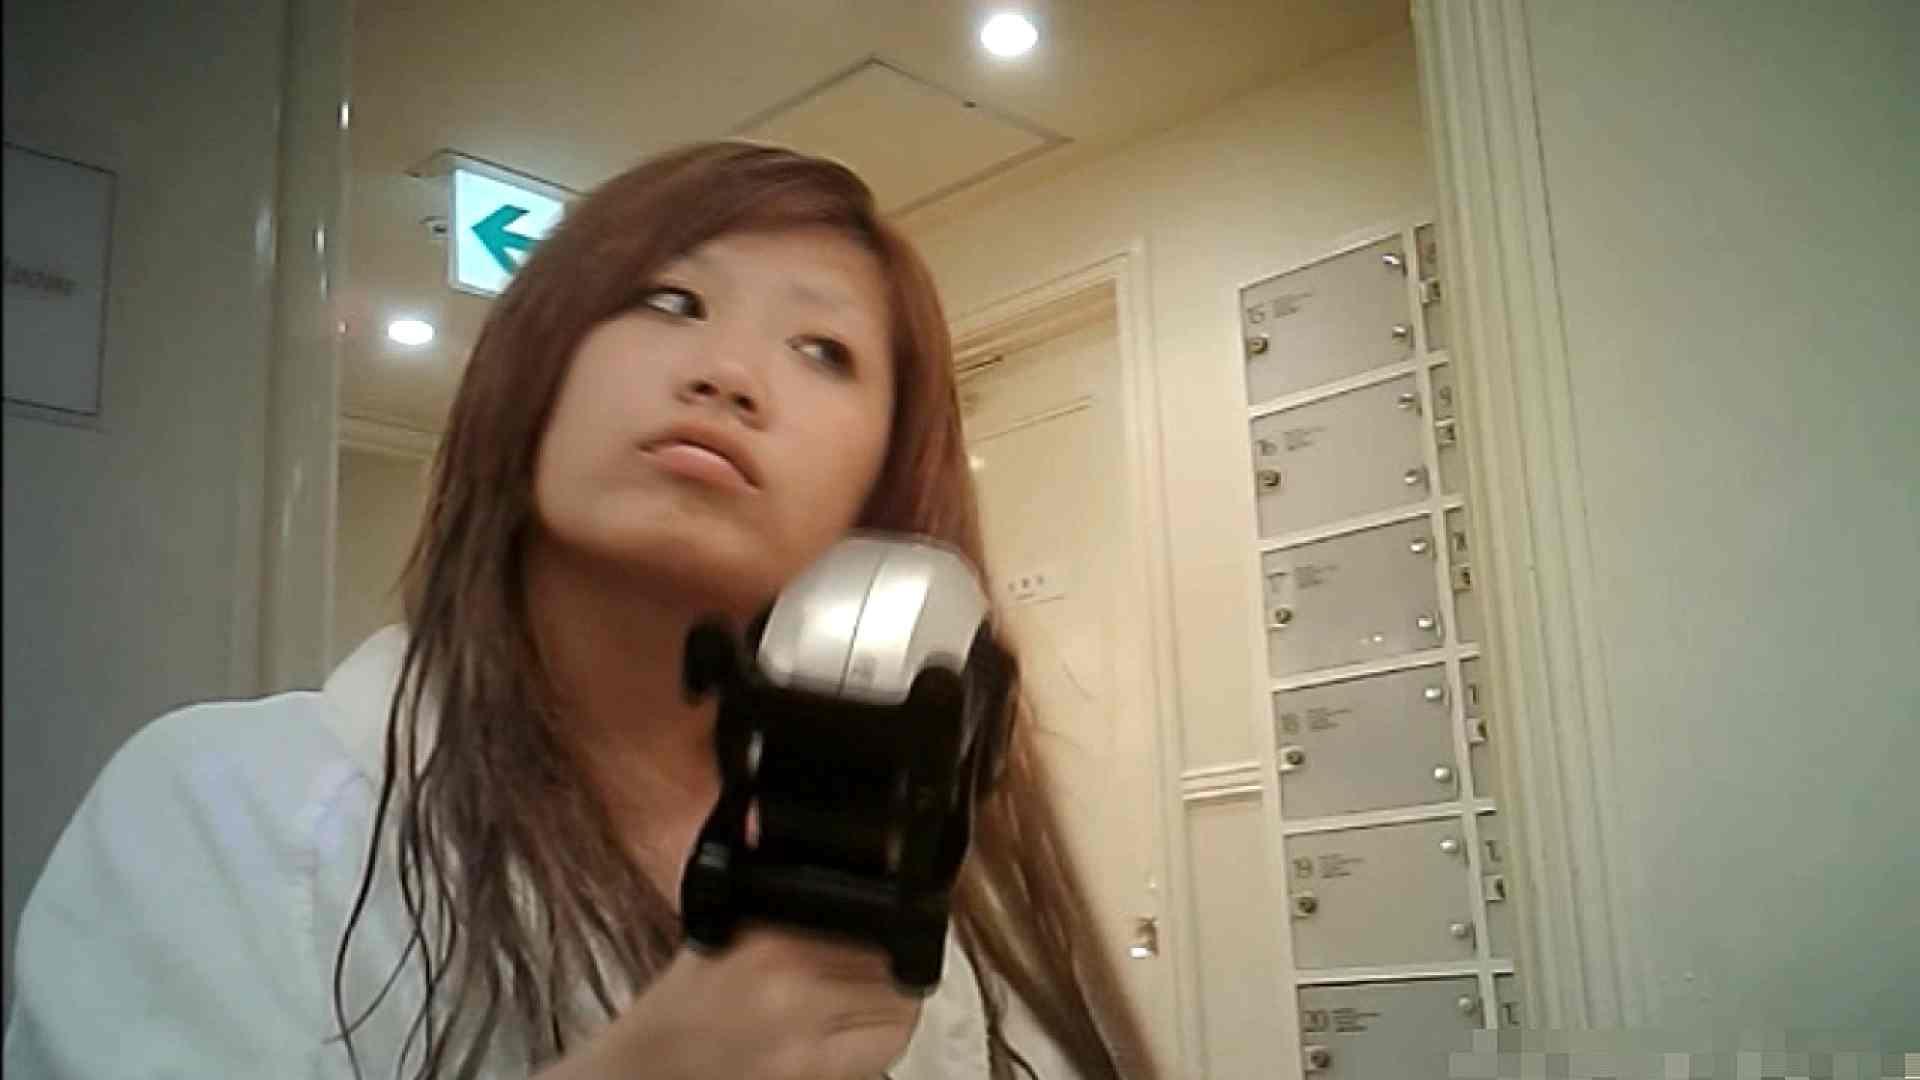 vol.7 【Mちゃん(入浴)】ブランド品査定士19歳 巨乳ギャル キャバ嬢 AV動画キャプチャ 99枚 95